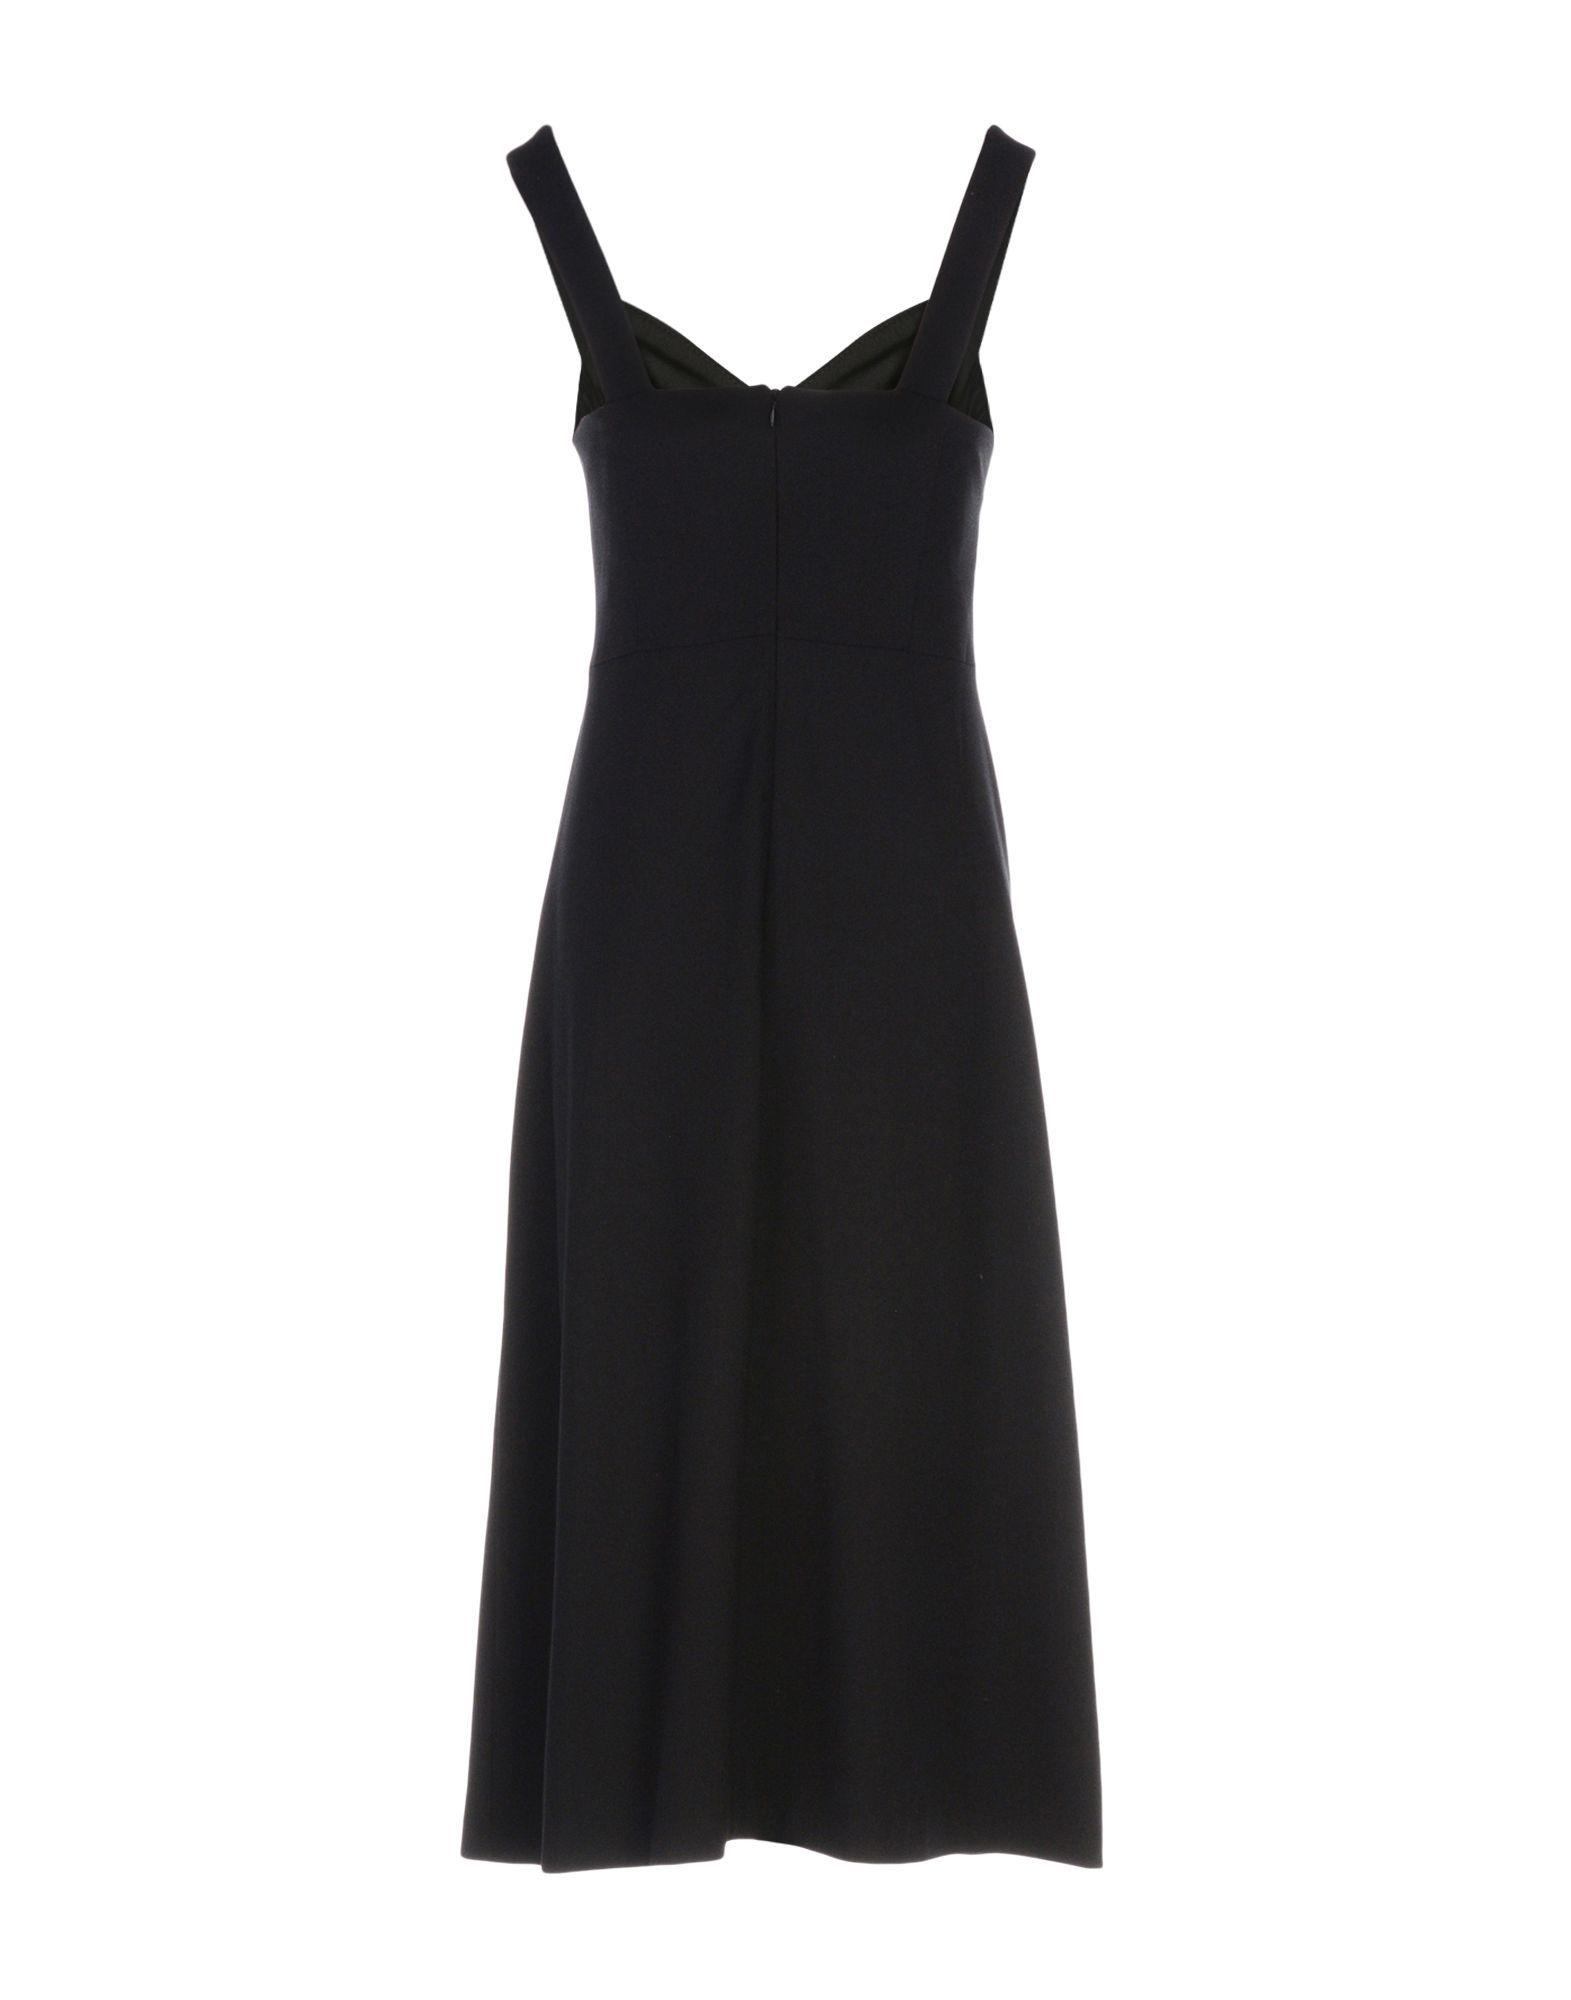 Chalayan Black Crepe Sleeveless Dress